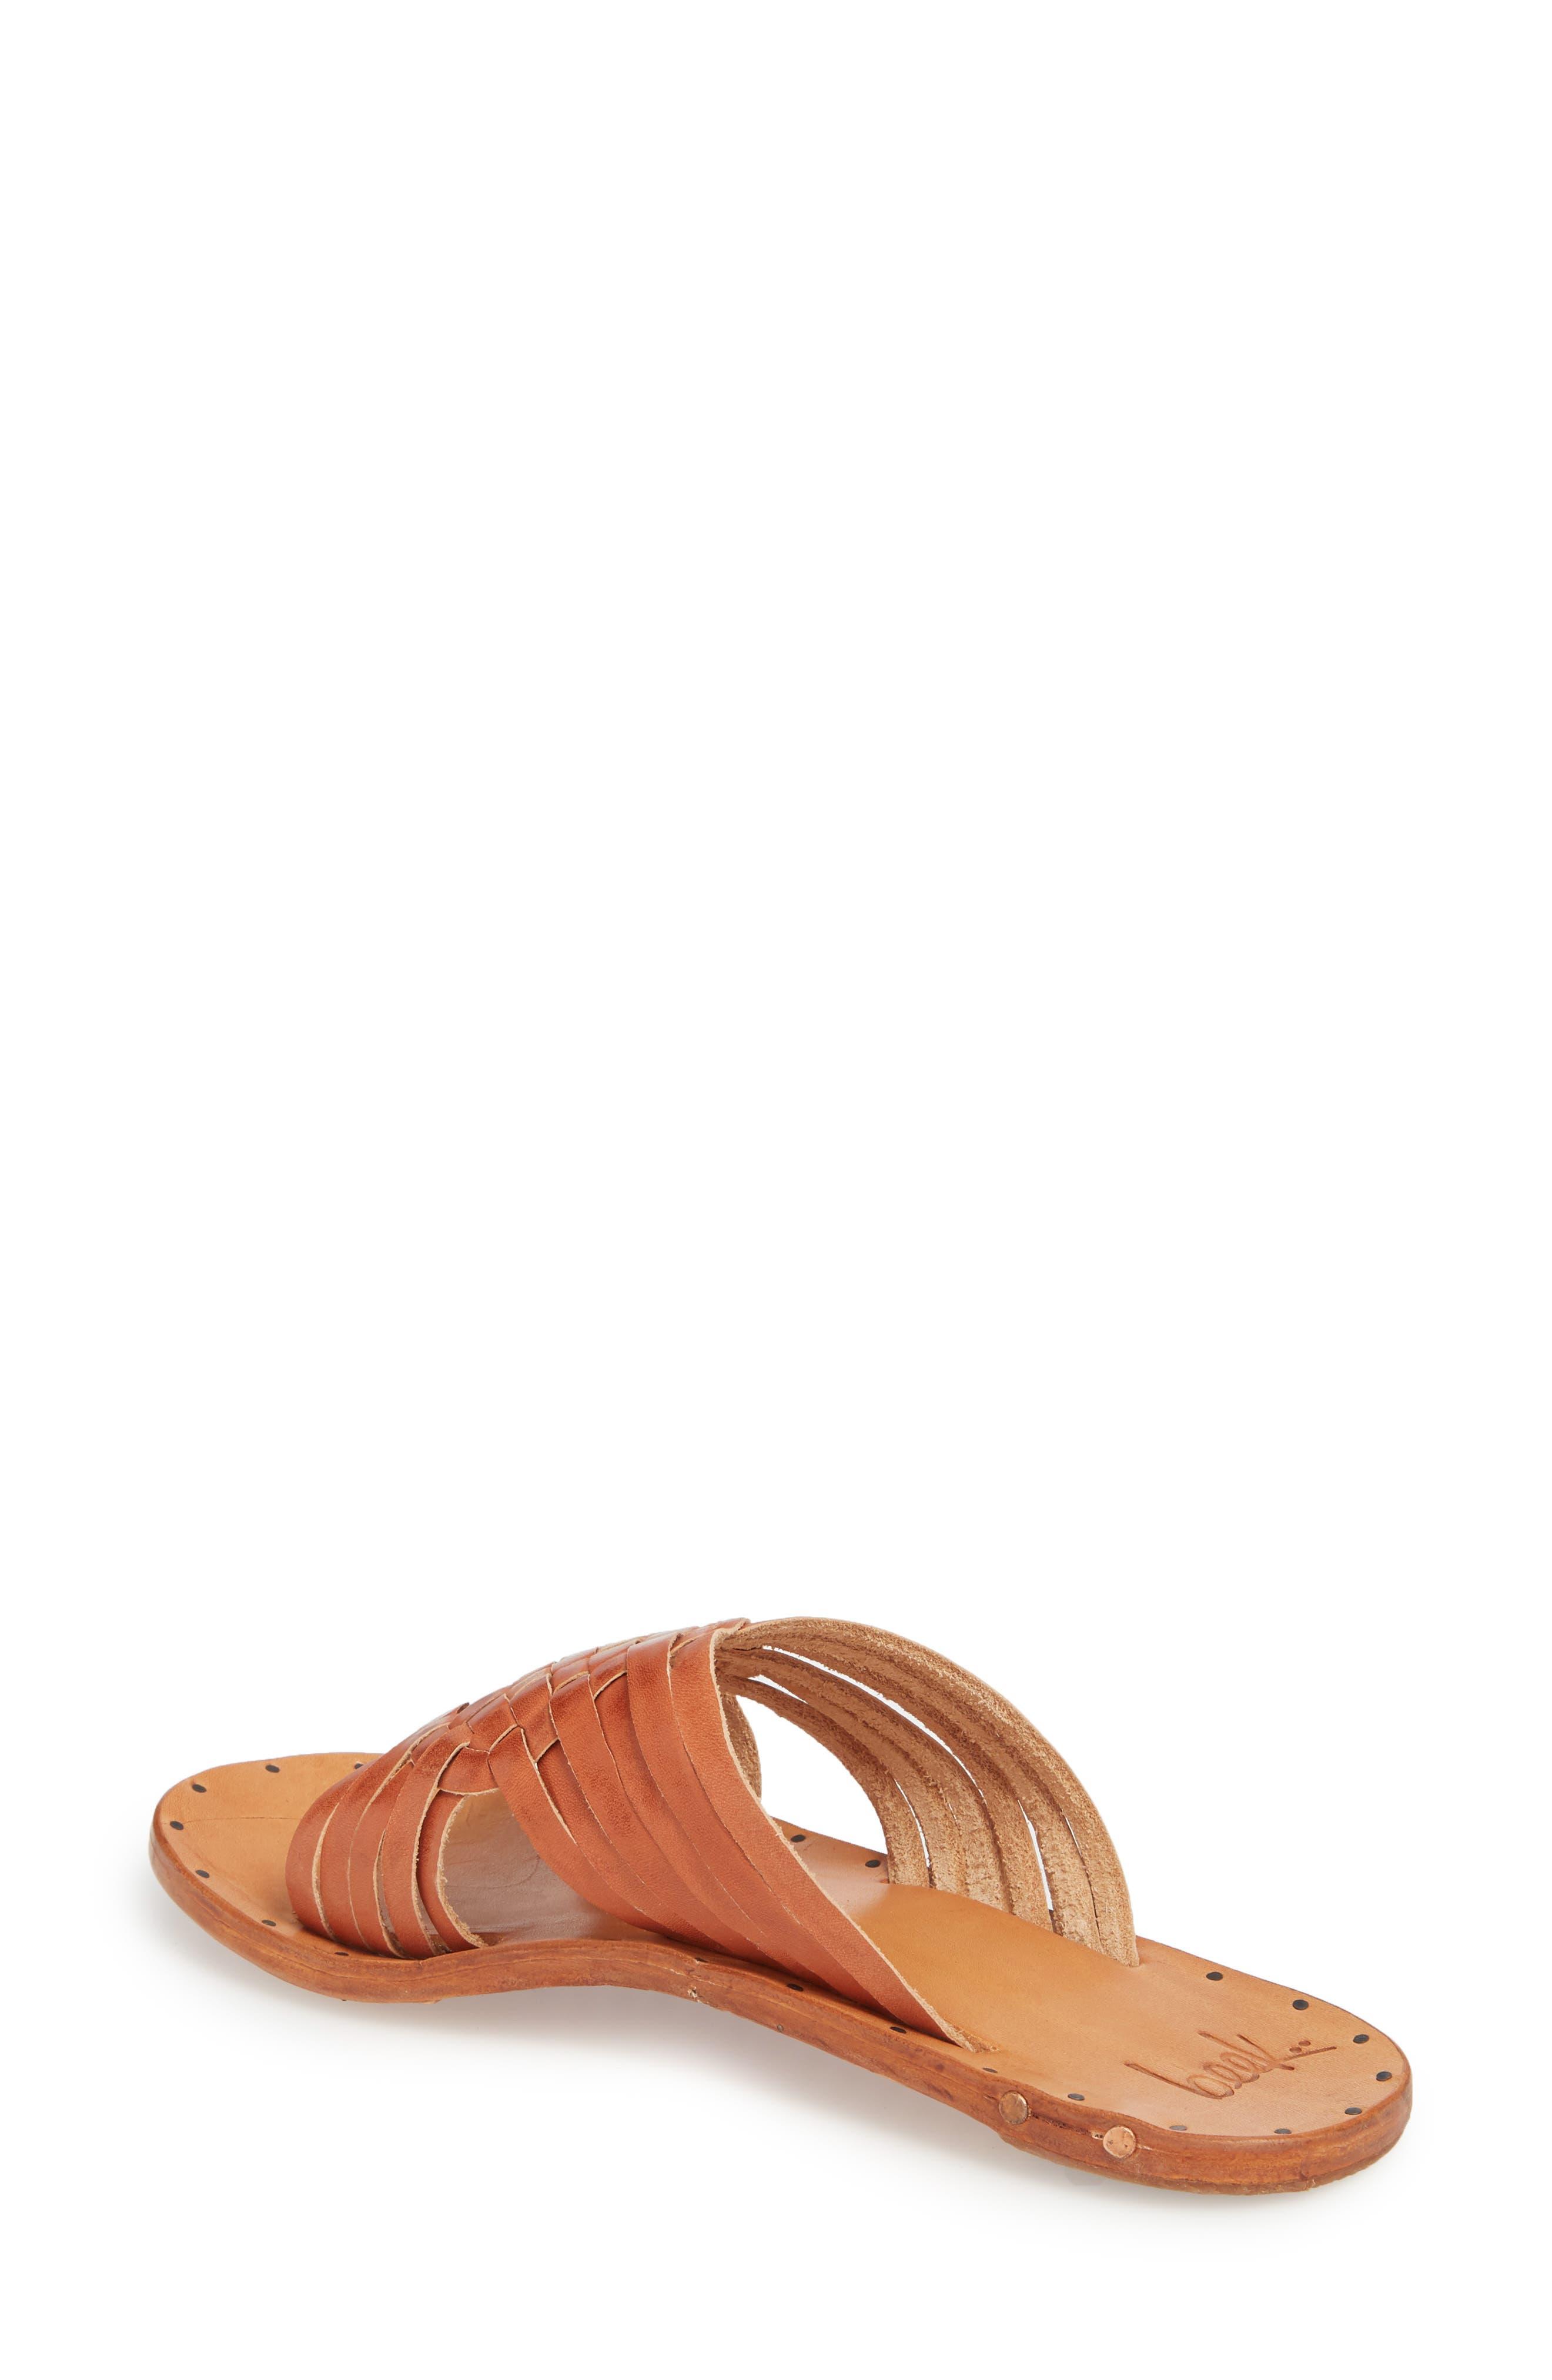 Alternate Image 2  - Beek Swallow Sandal (Women)